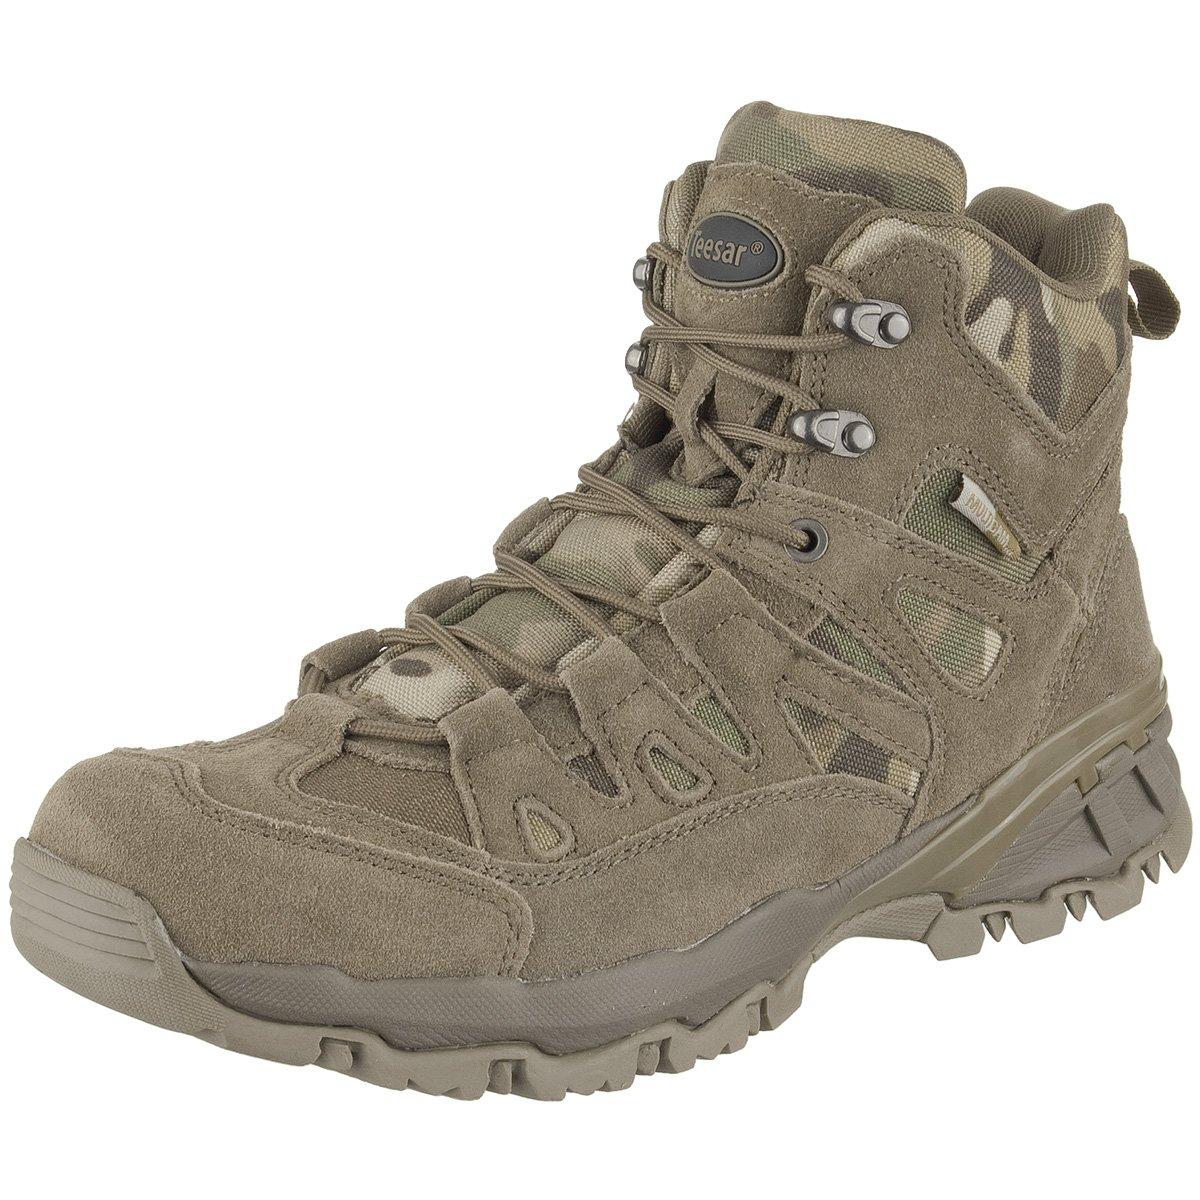 Teesar Squad Boots MultiCam size 9 UK / 10 US